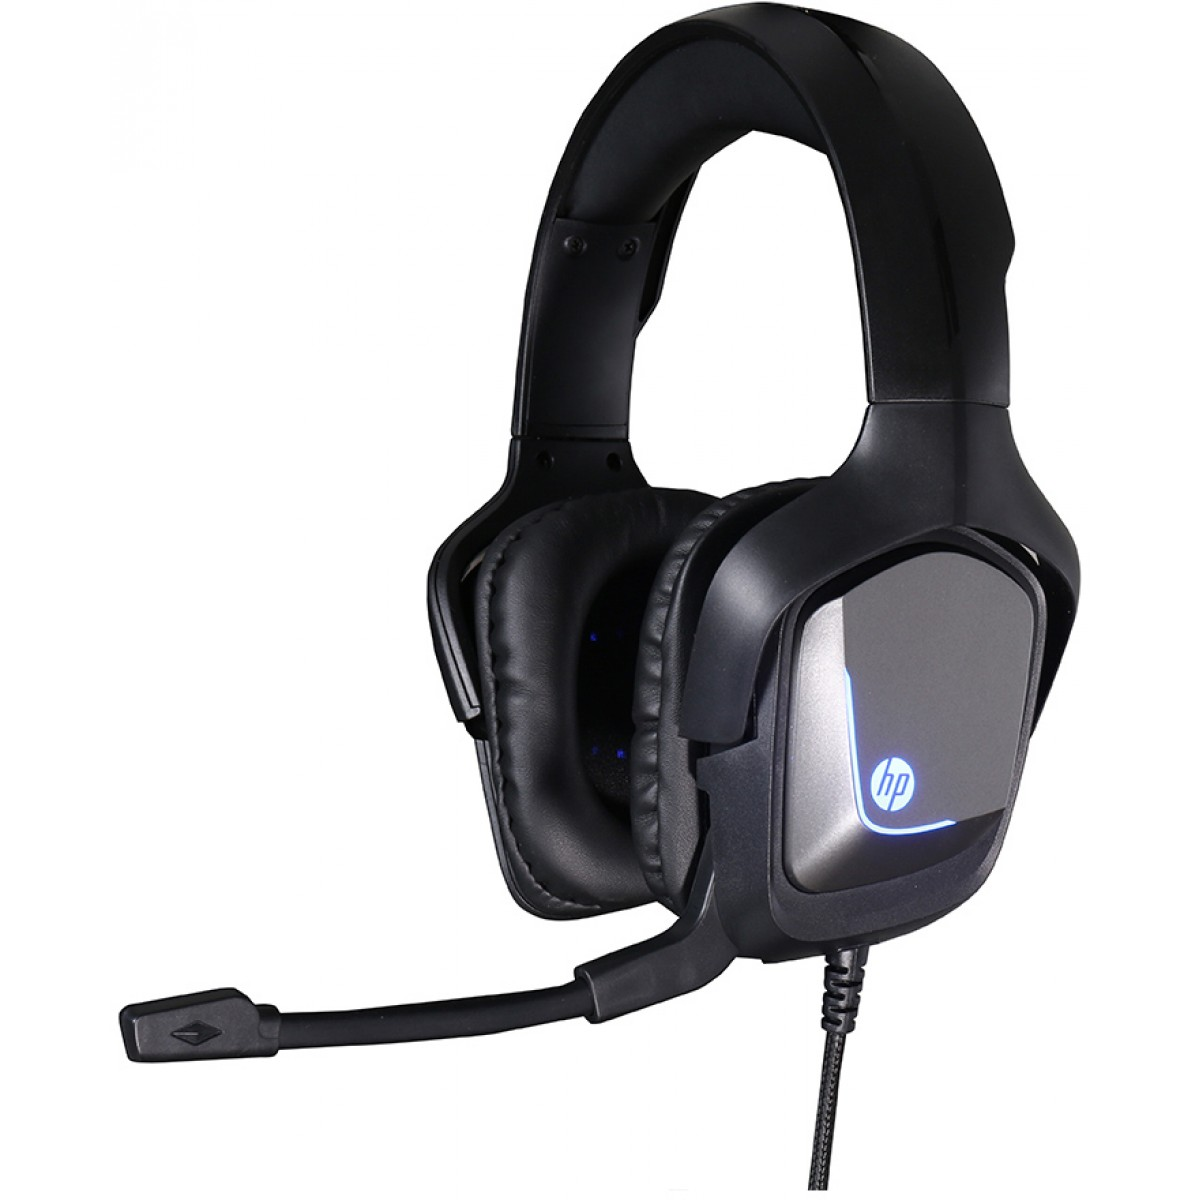 Headset Gamer HP H220GS, Surround 7.1, USB, Led Blue